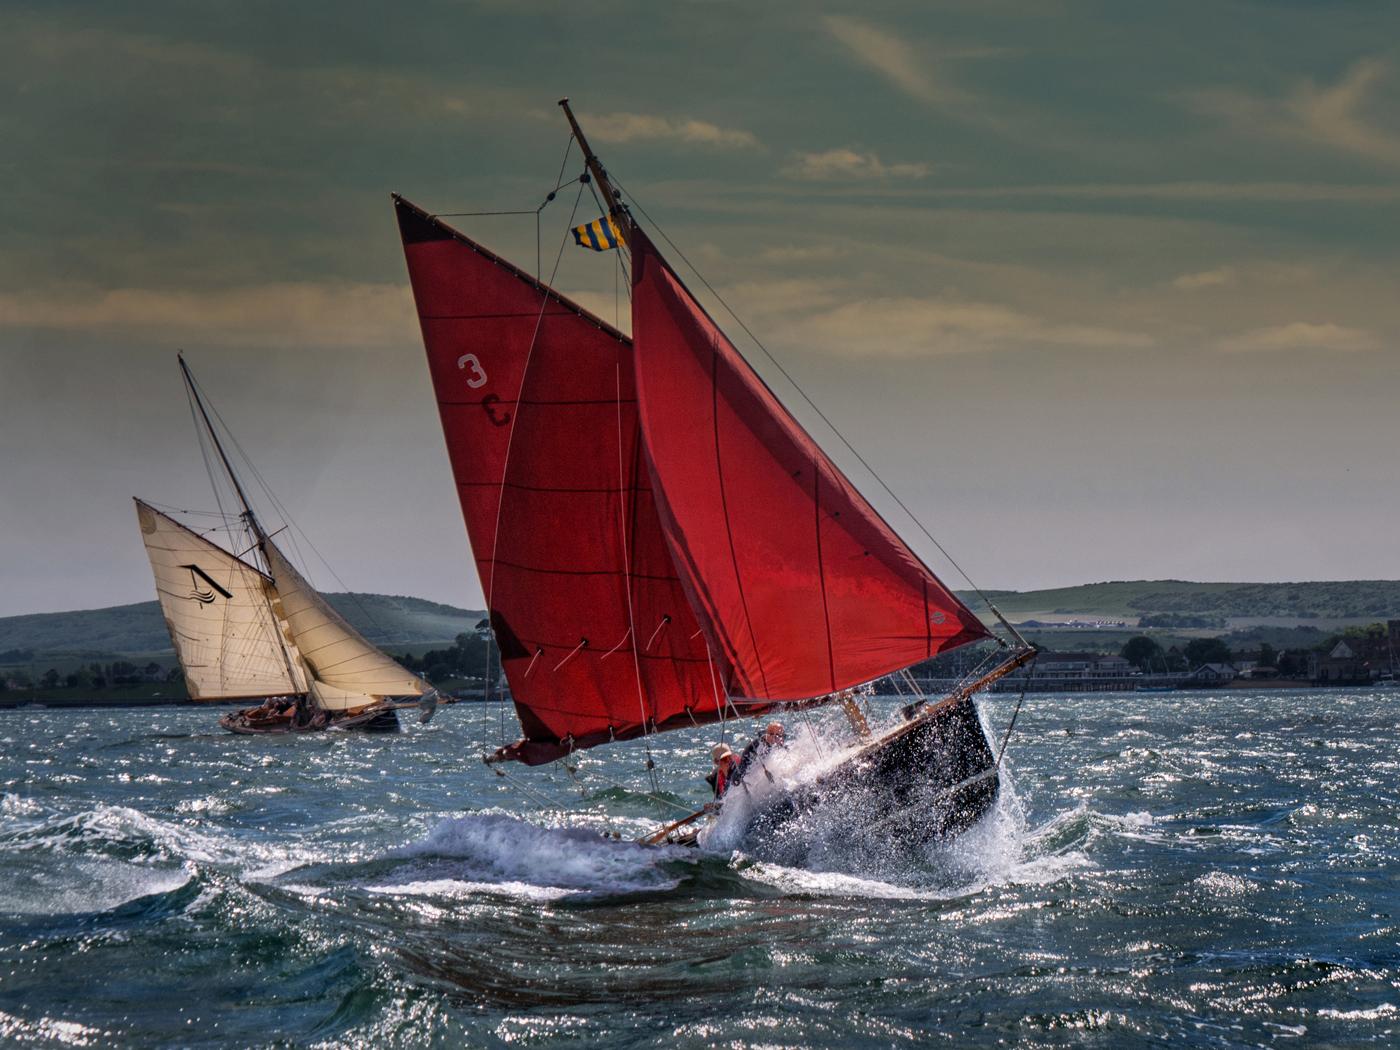 First 'Sea Spray' by Ian Porter